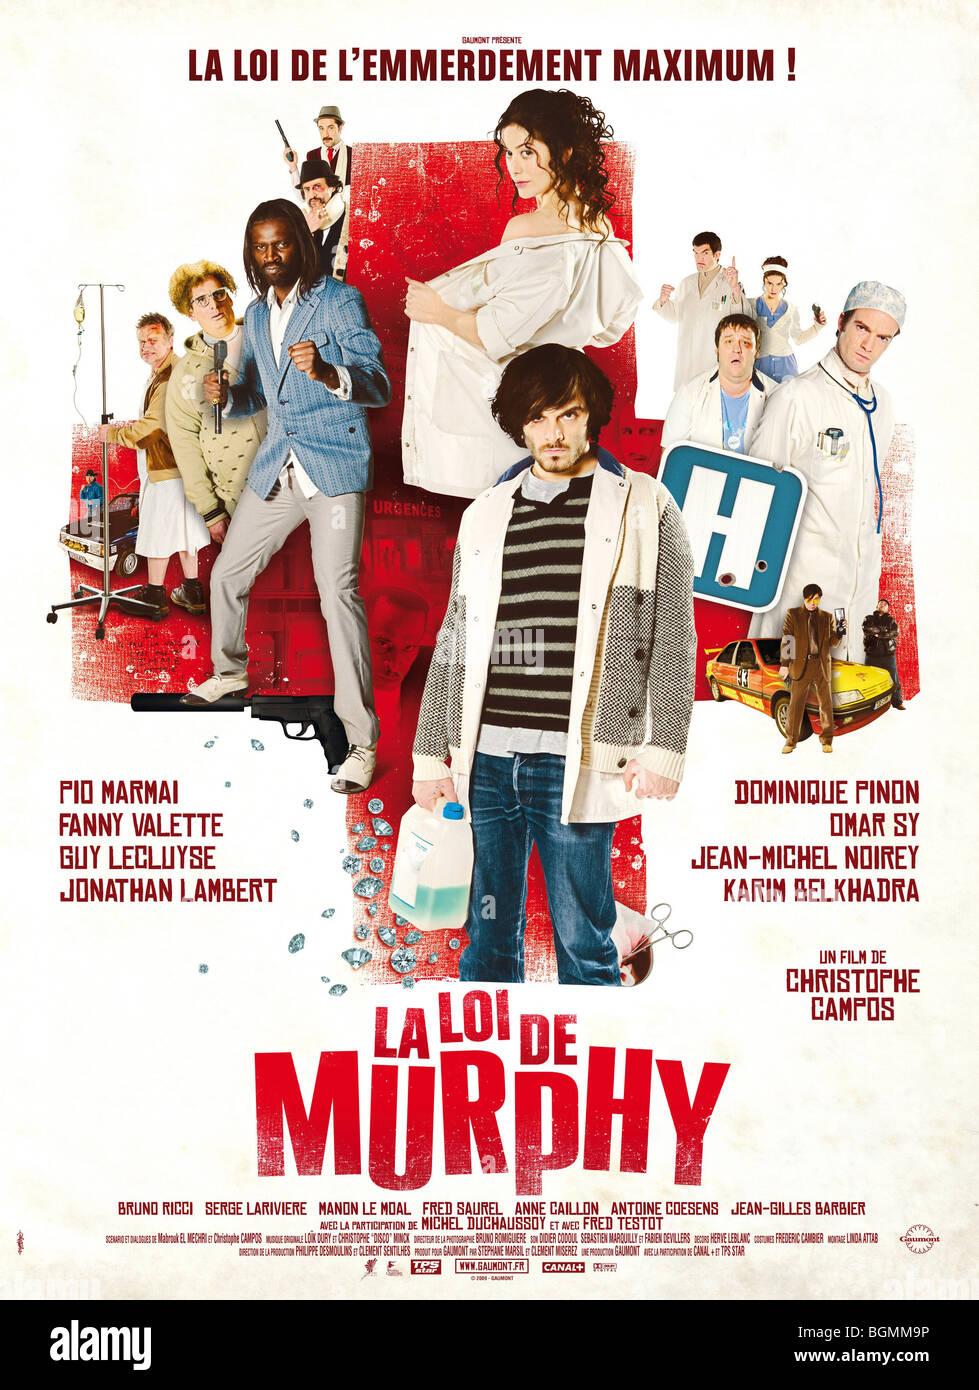 La Loi de Murphy Year : 2009 Director : Christophe Campos Pio Marmai Movie poster (Fr) - Stock Image